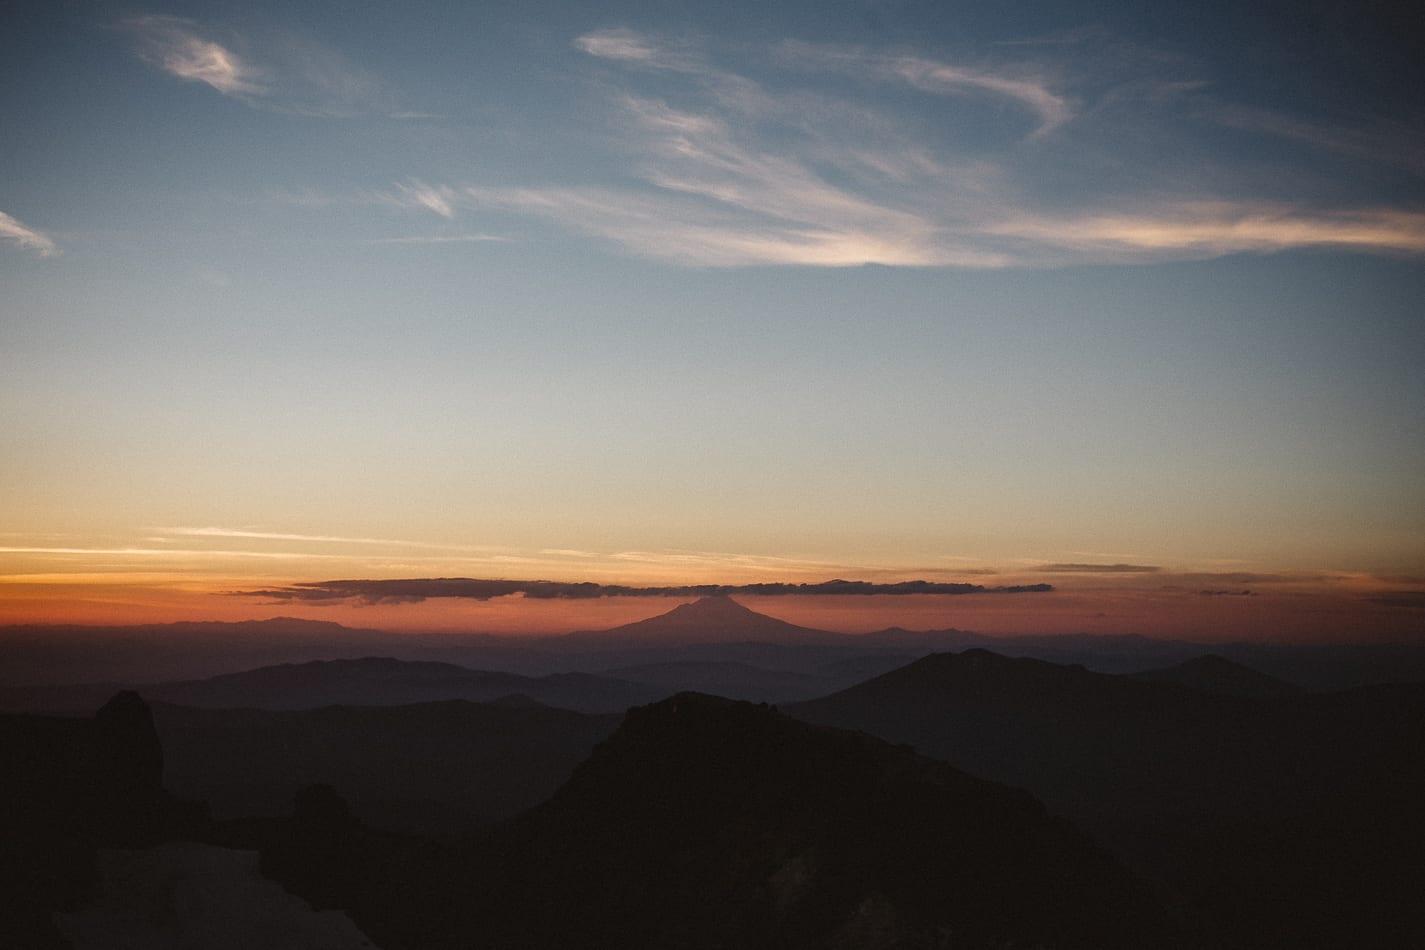 mount-lassen-california-adventure-lifestyle-photorapher-34